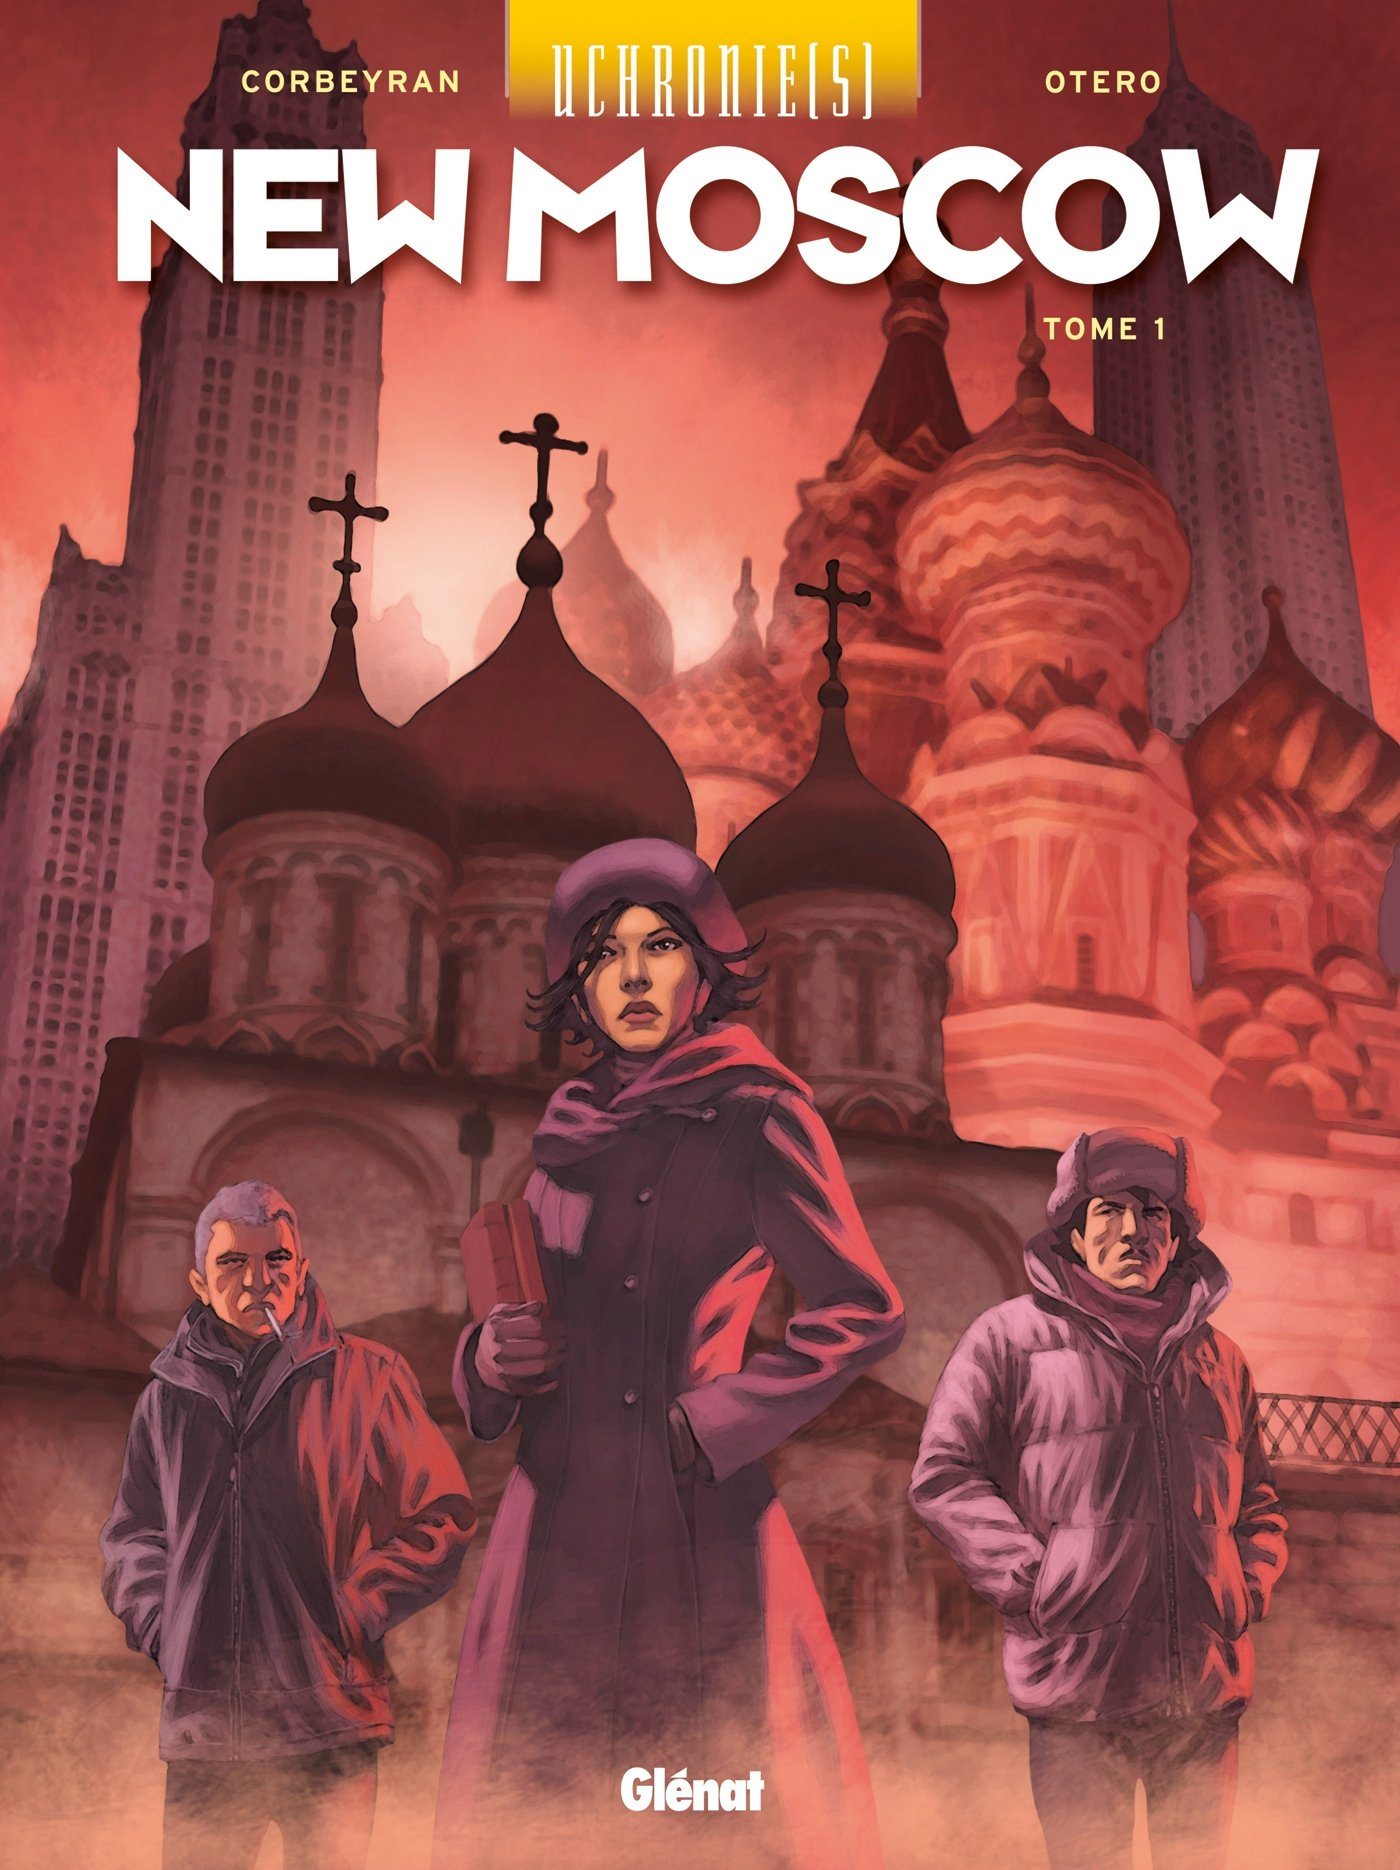 Uchronie[s] - New Moscow - Tome 01 Album – 17 octobre 2012 Corbeyran Nicolas Otero Glénat BD 2723483452